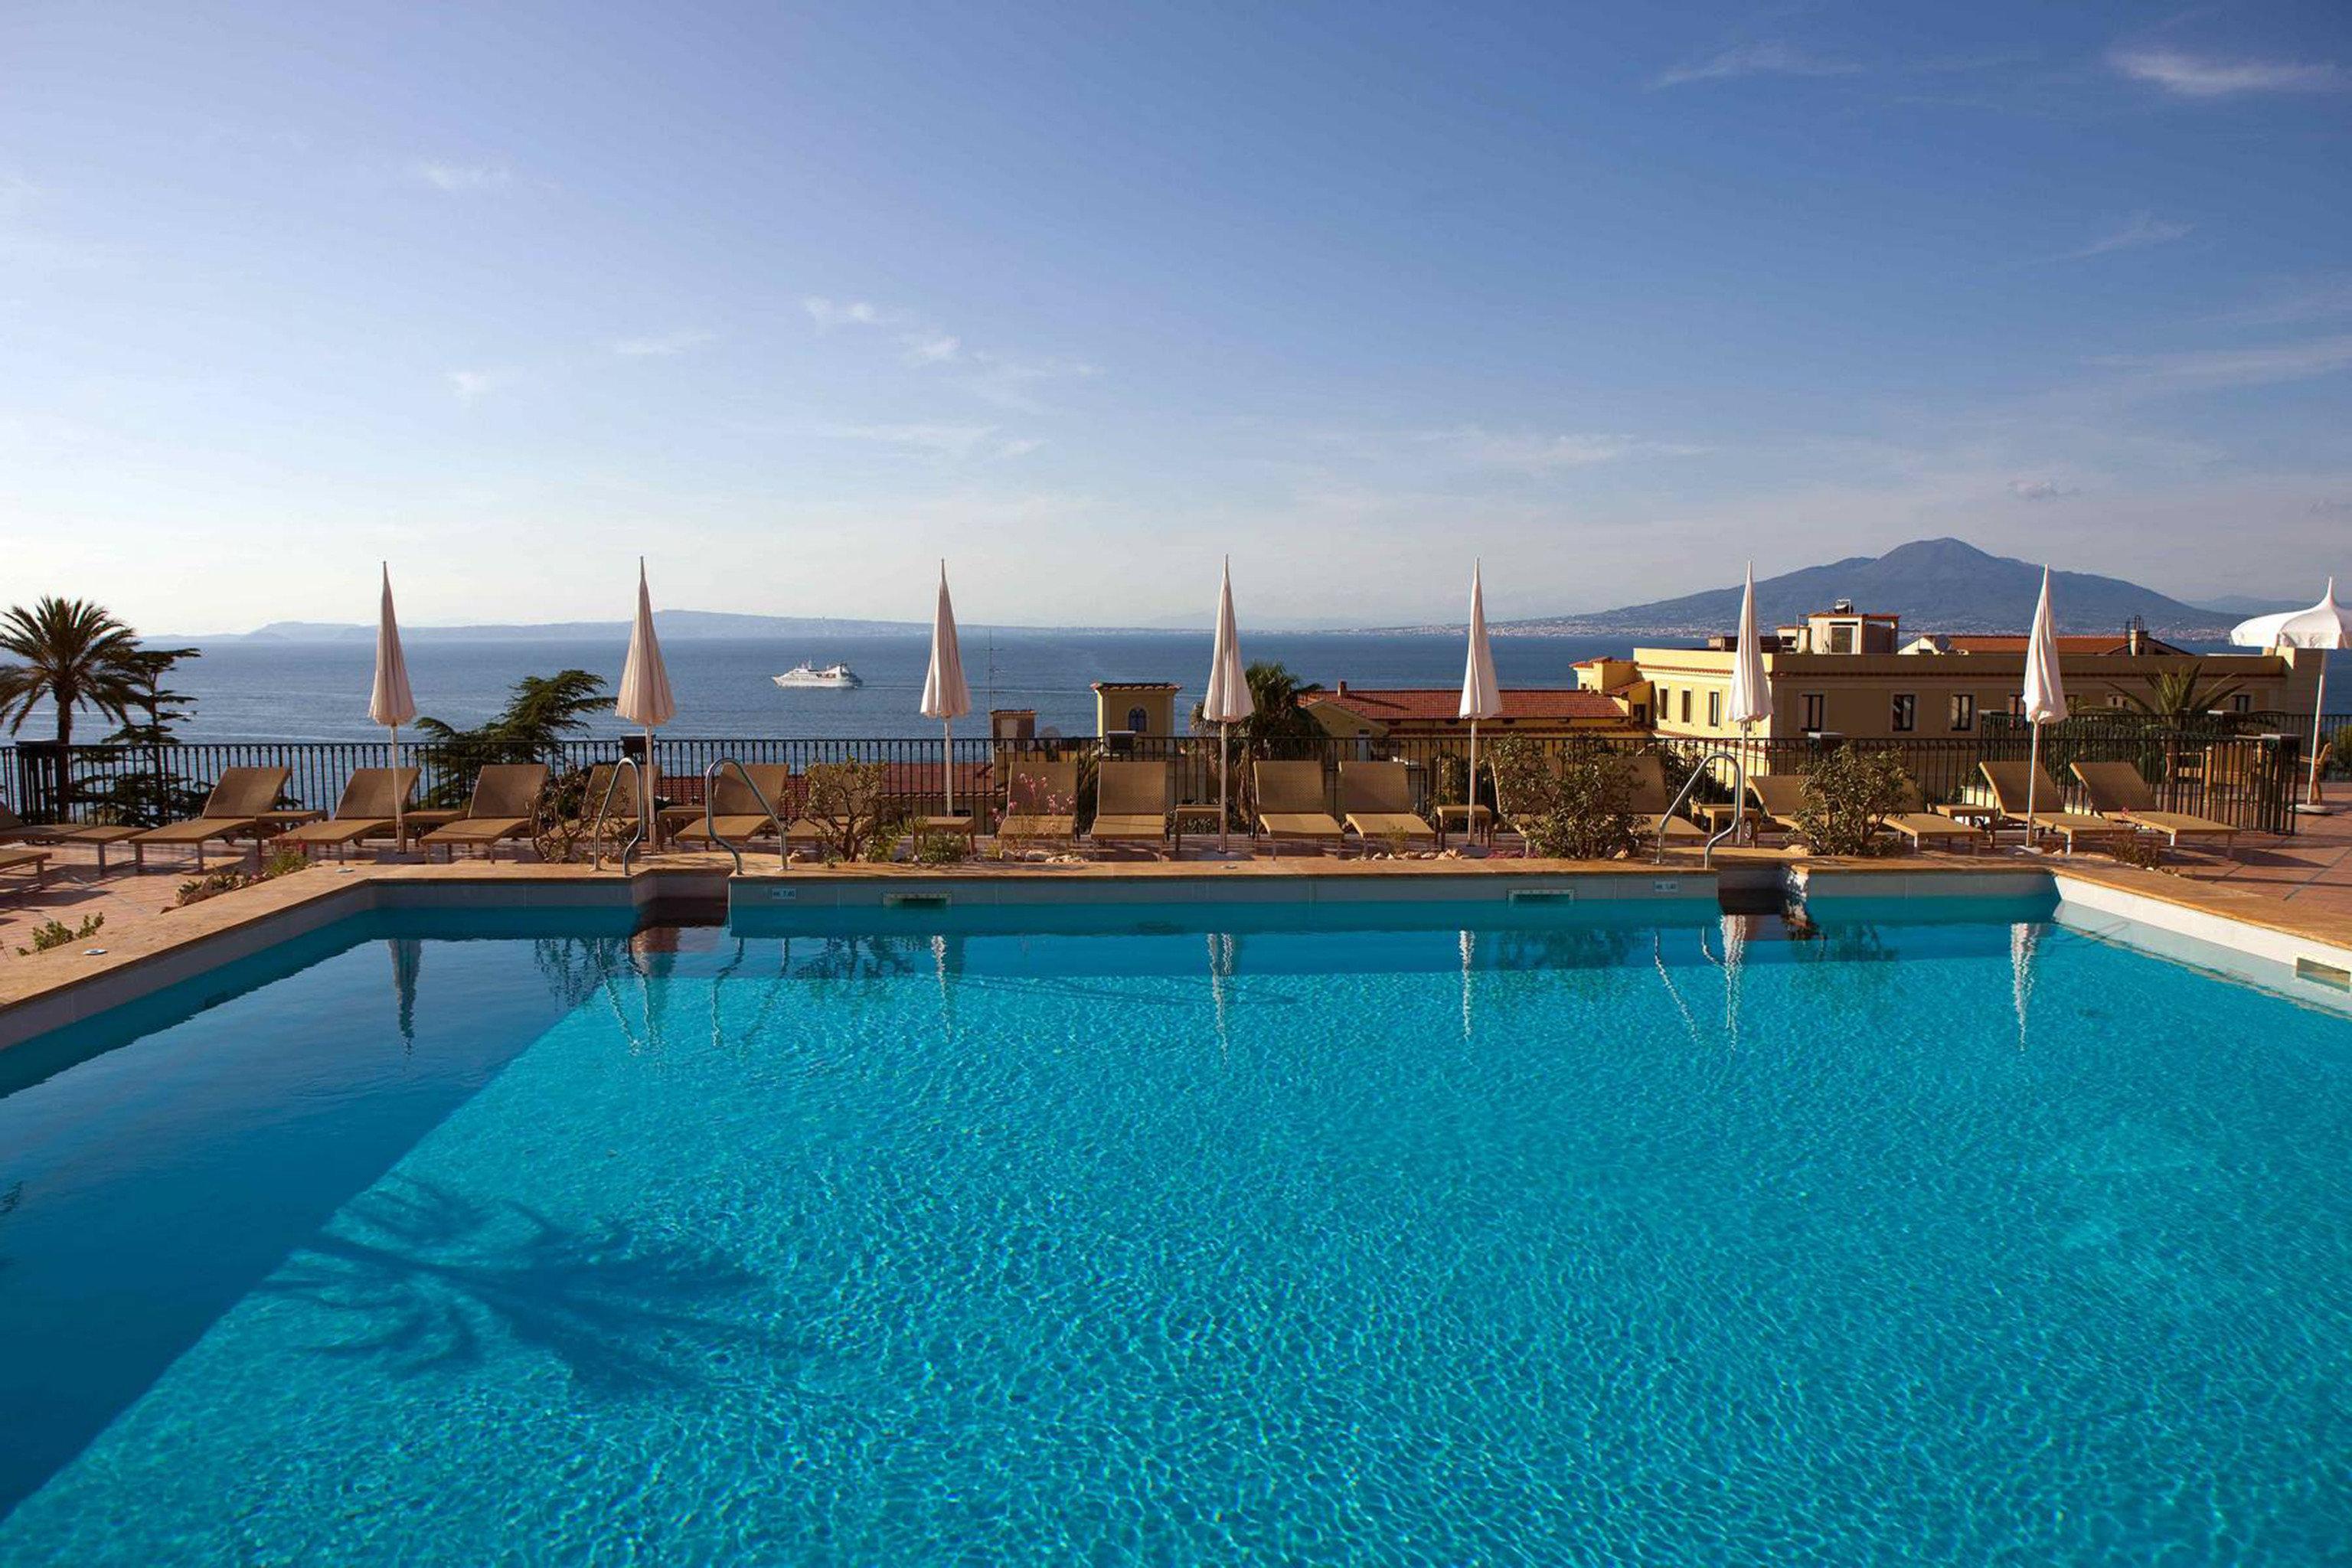 Classic Pool Scenic views Sea sky water swimming pool property chair leisure Resort Ocean blue water sport Villa marina swimming reef day